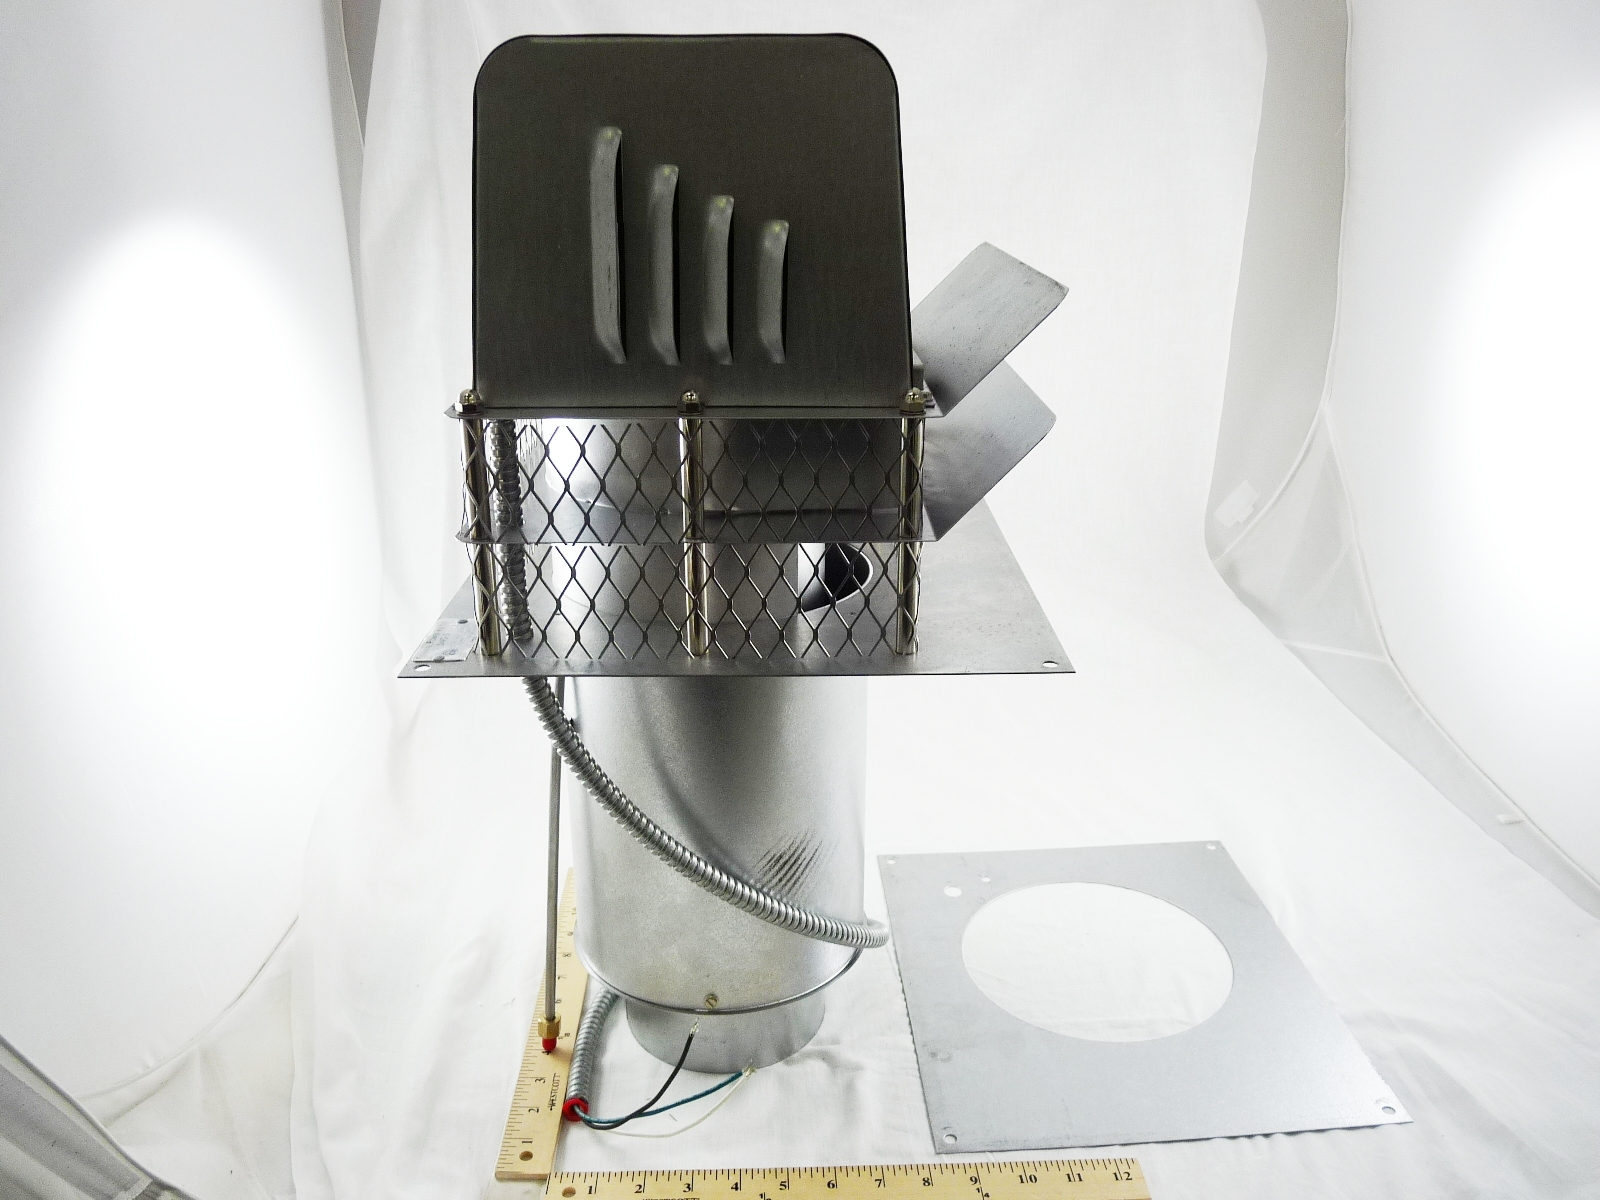 Field Controls 46230000 Swg 5 Power Vent 5 Quot